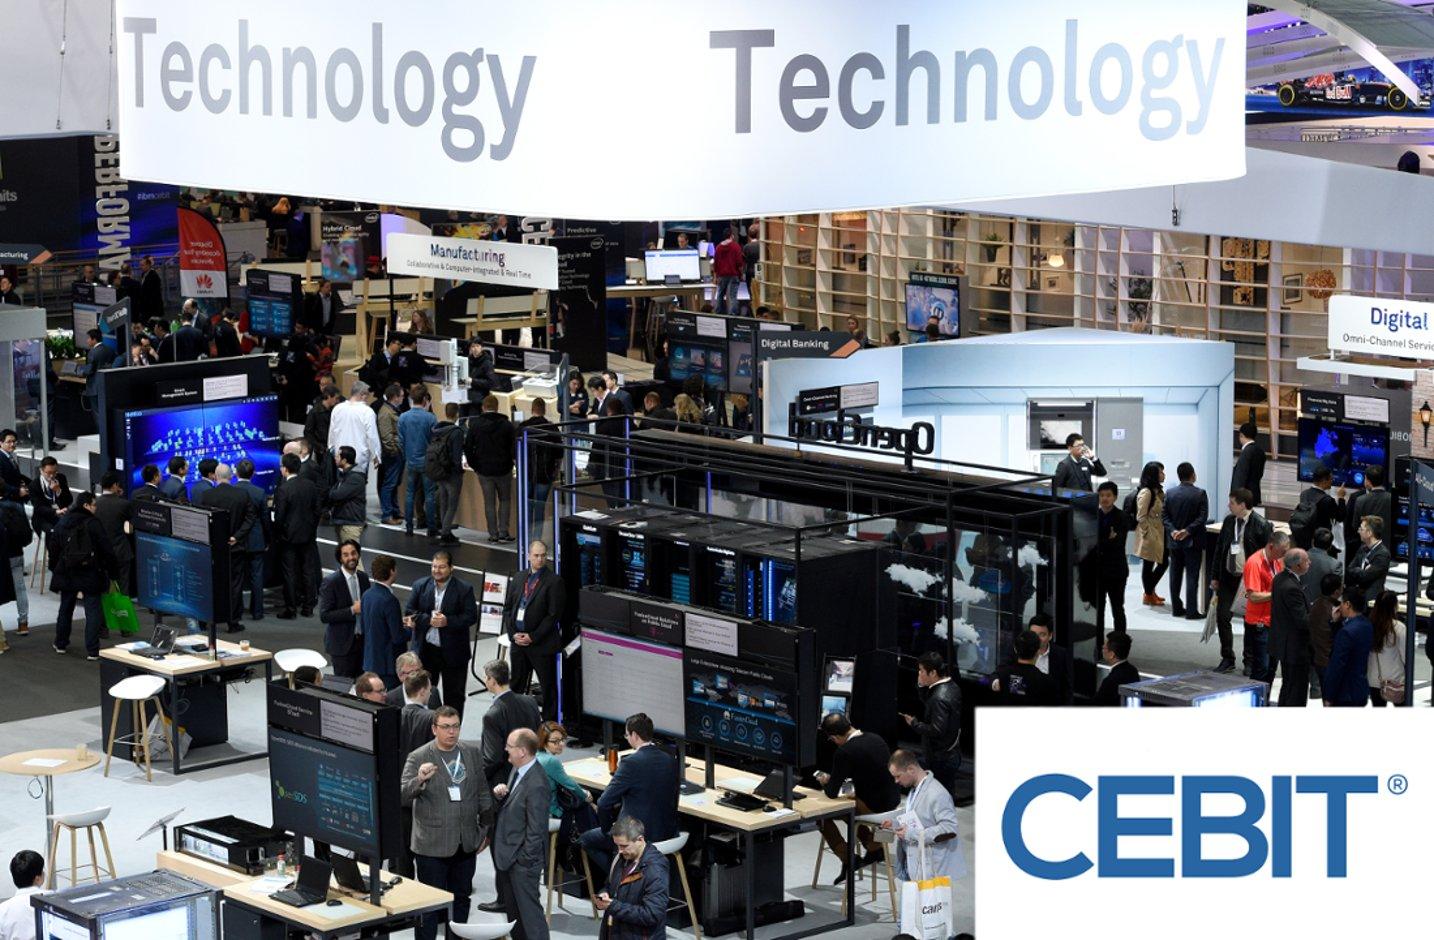 cosinuss°at Europe's Business Festival for Innovation & Digitization, CEBIT 2018